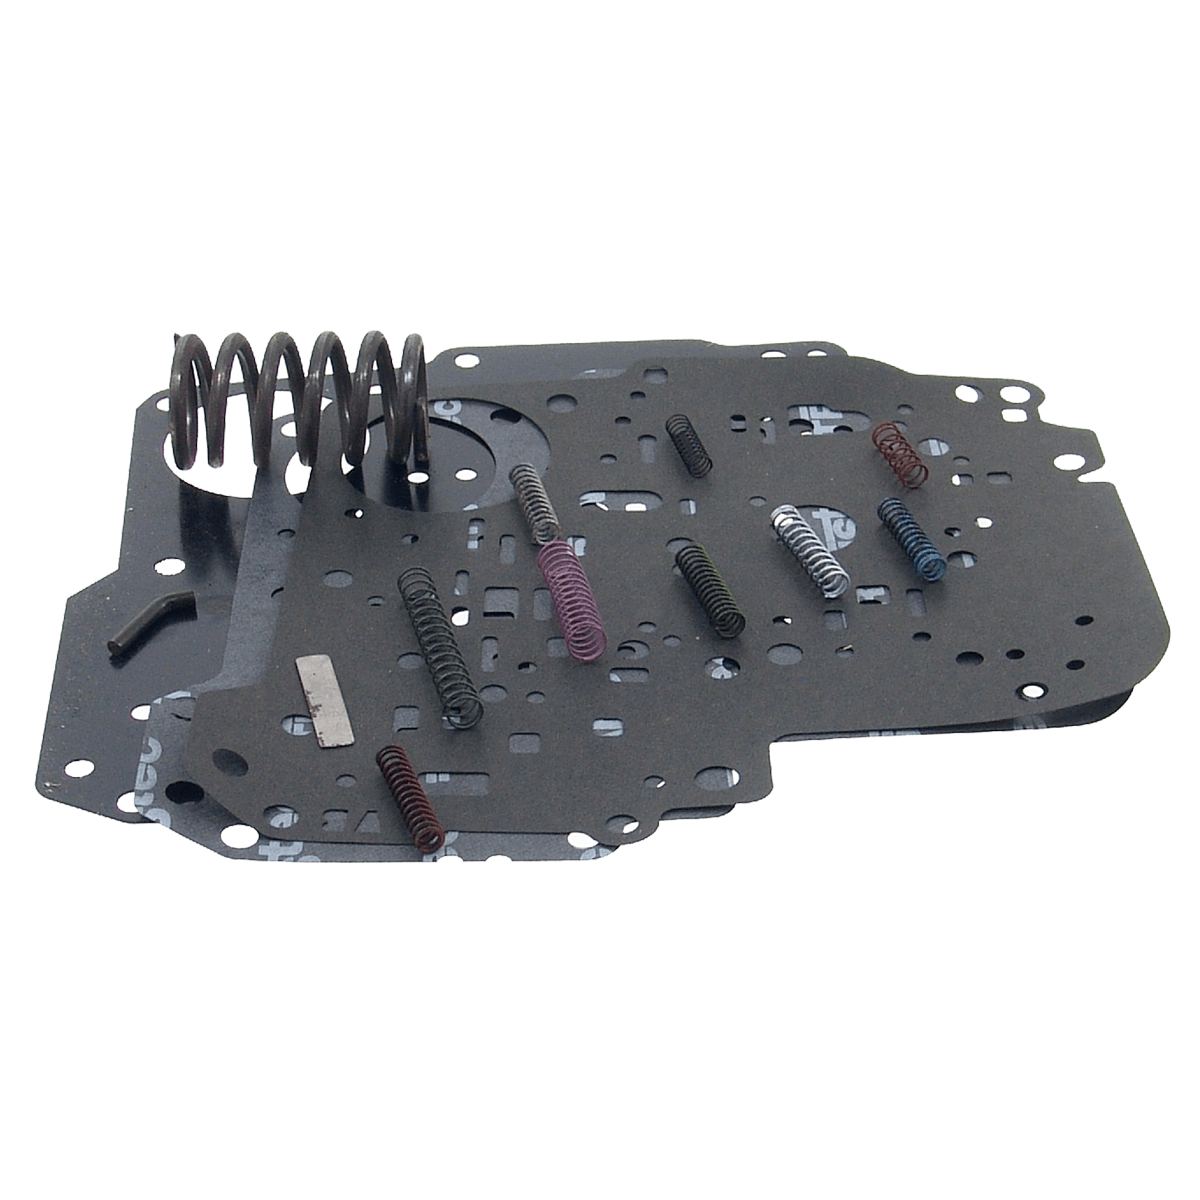 GM 200 SHIFT KIT® Valve Body Repair Kit